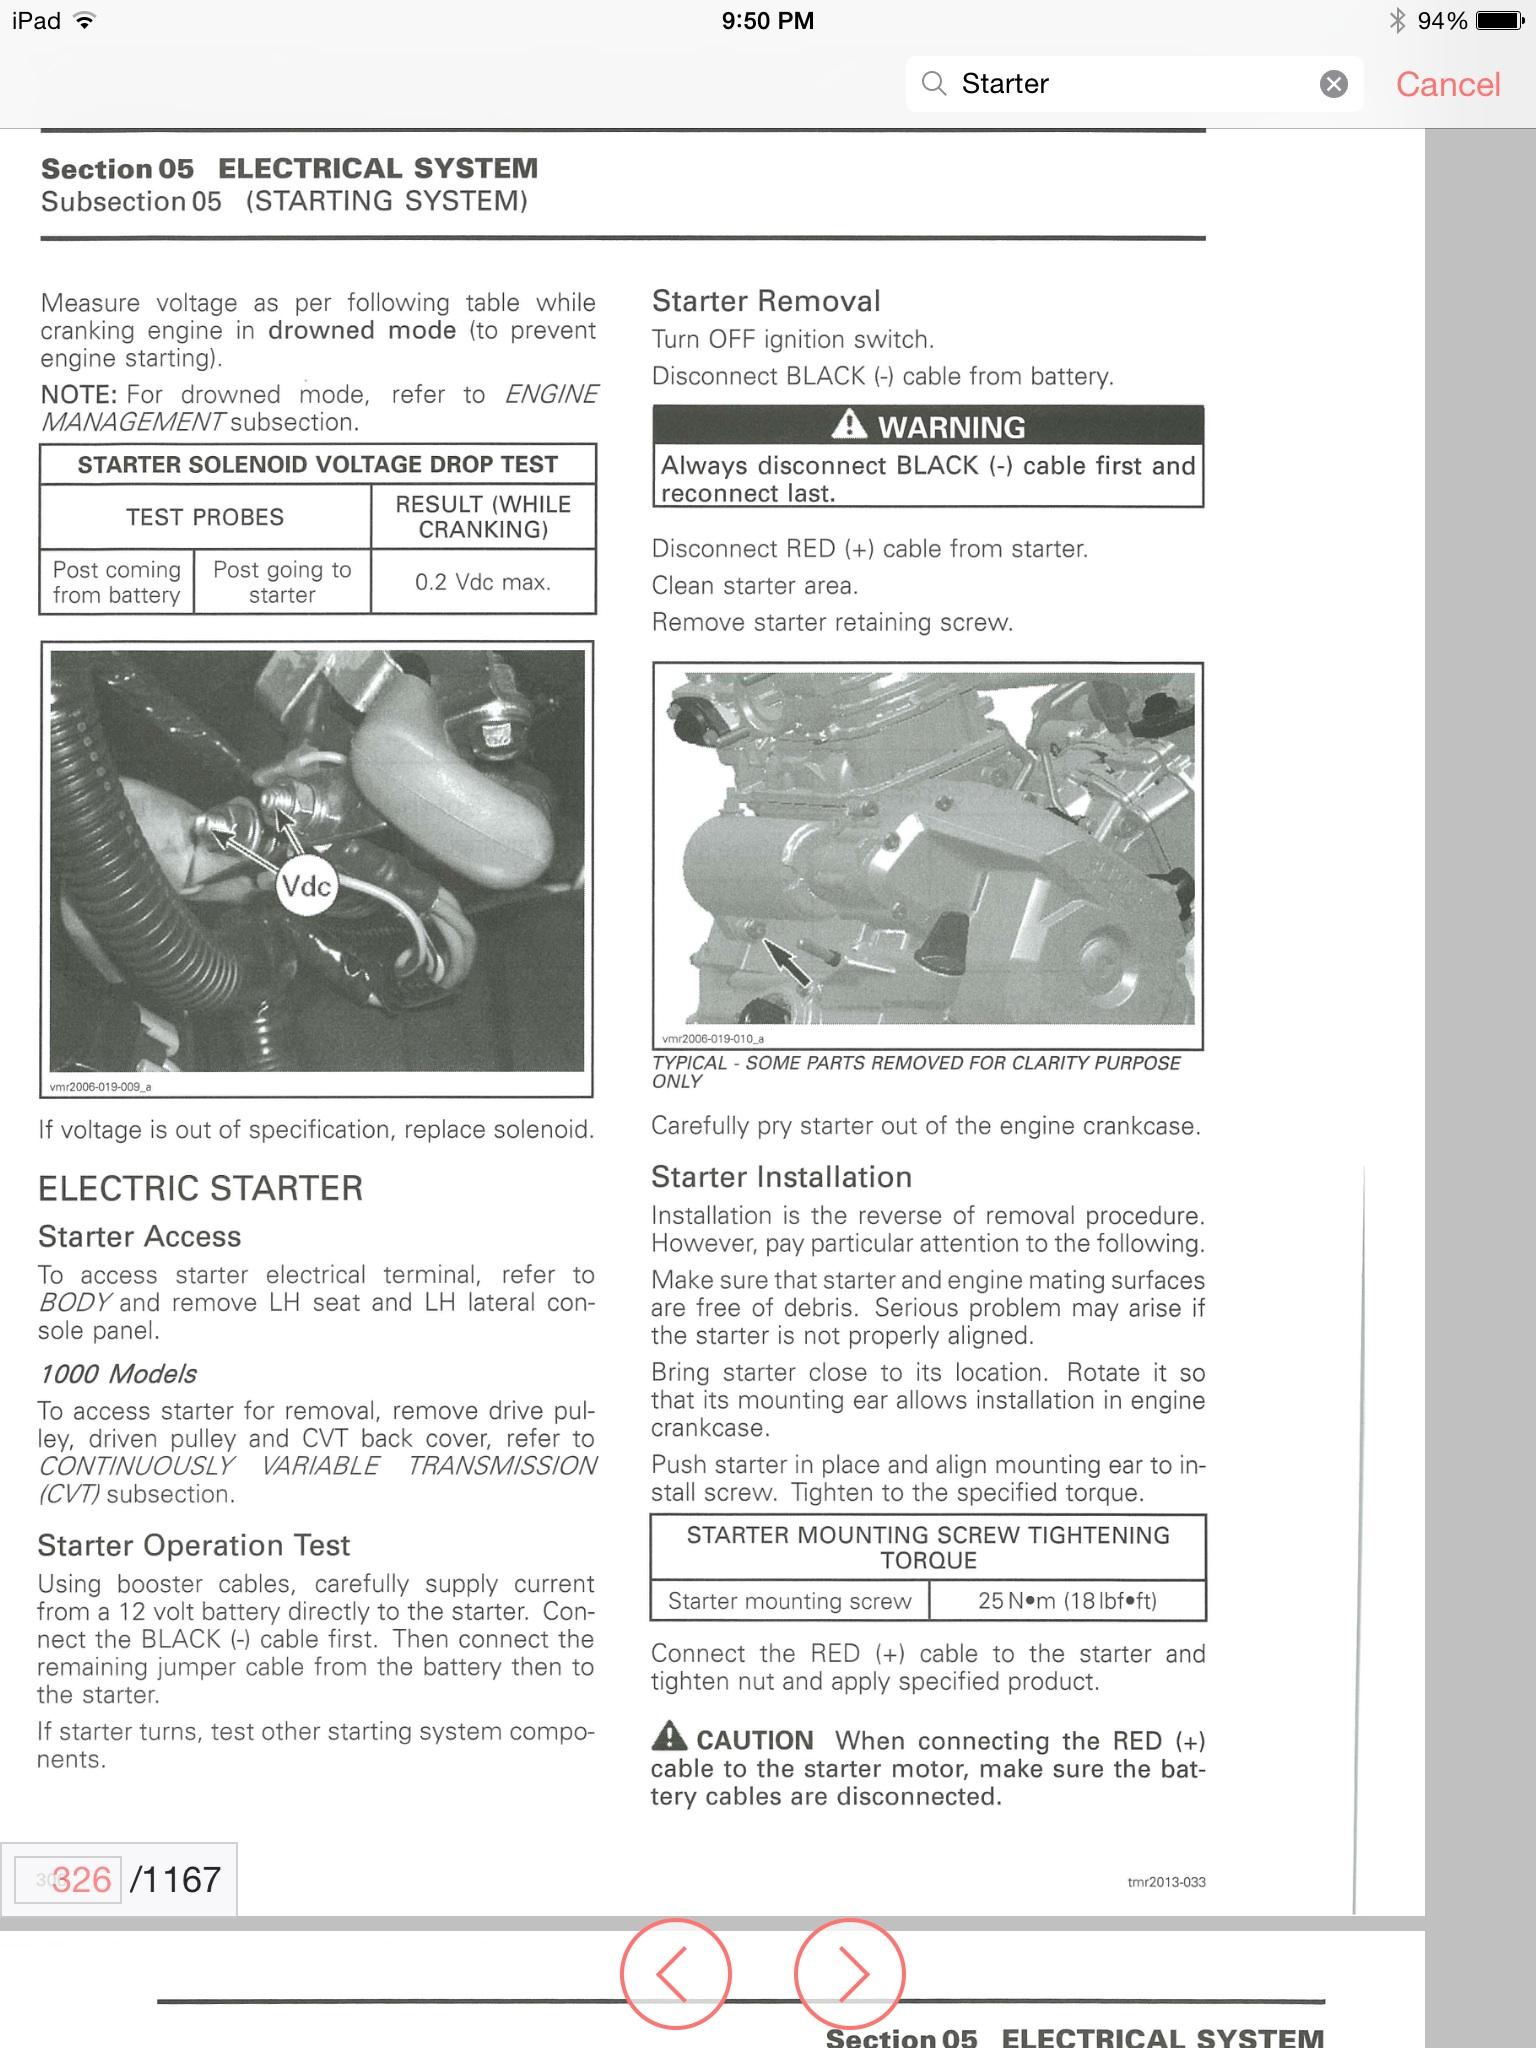 solenoid wiring diagram can am 800 commander house wiring diagram rh mollusksurfshopnyc com